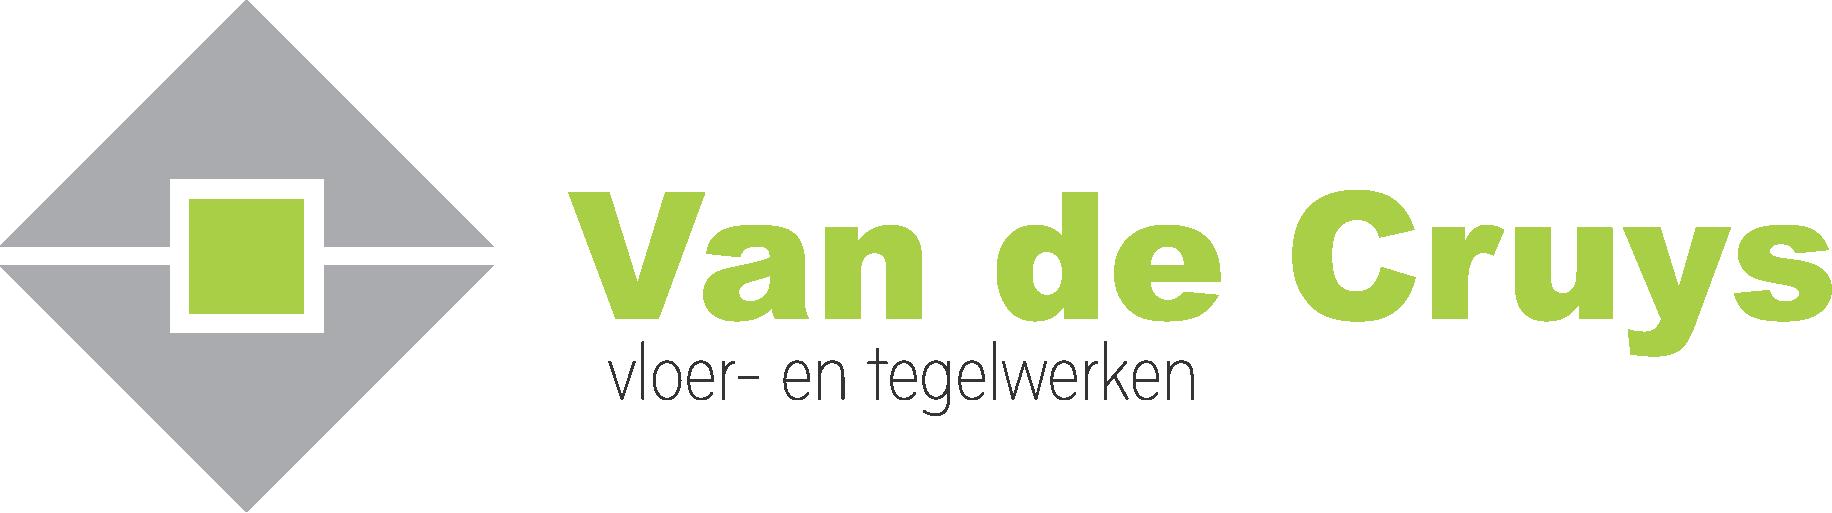 logo_vandecruys